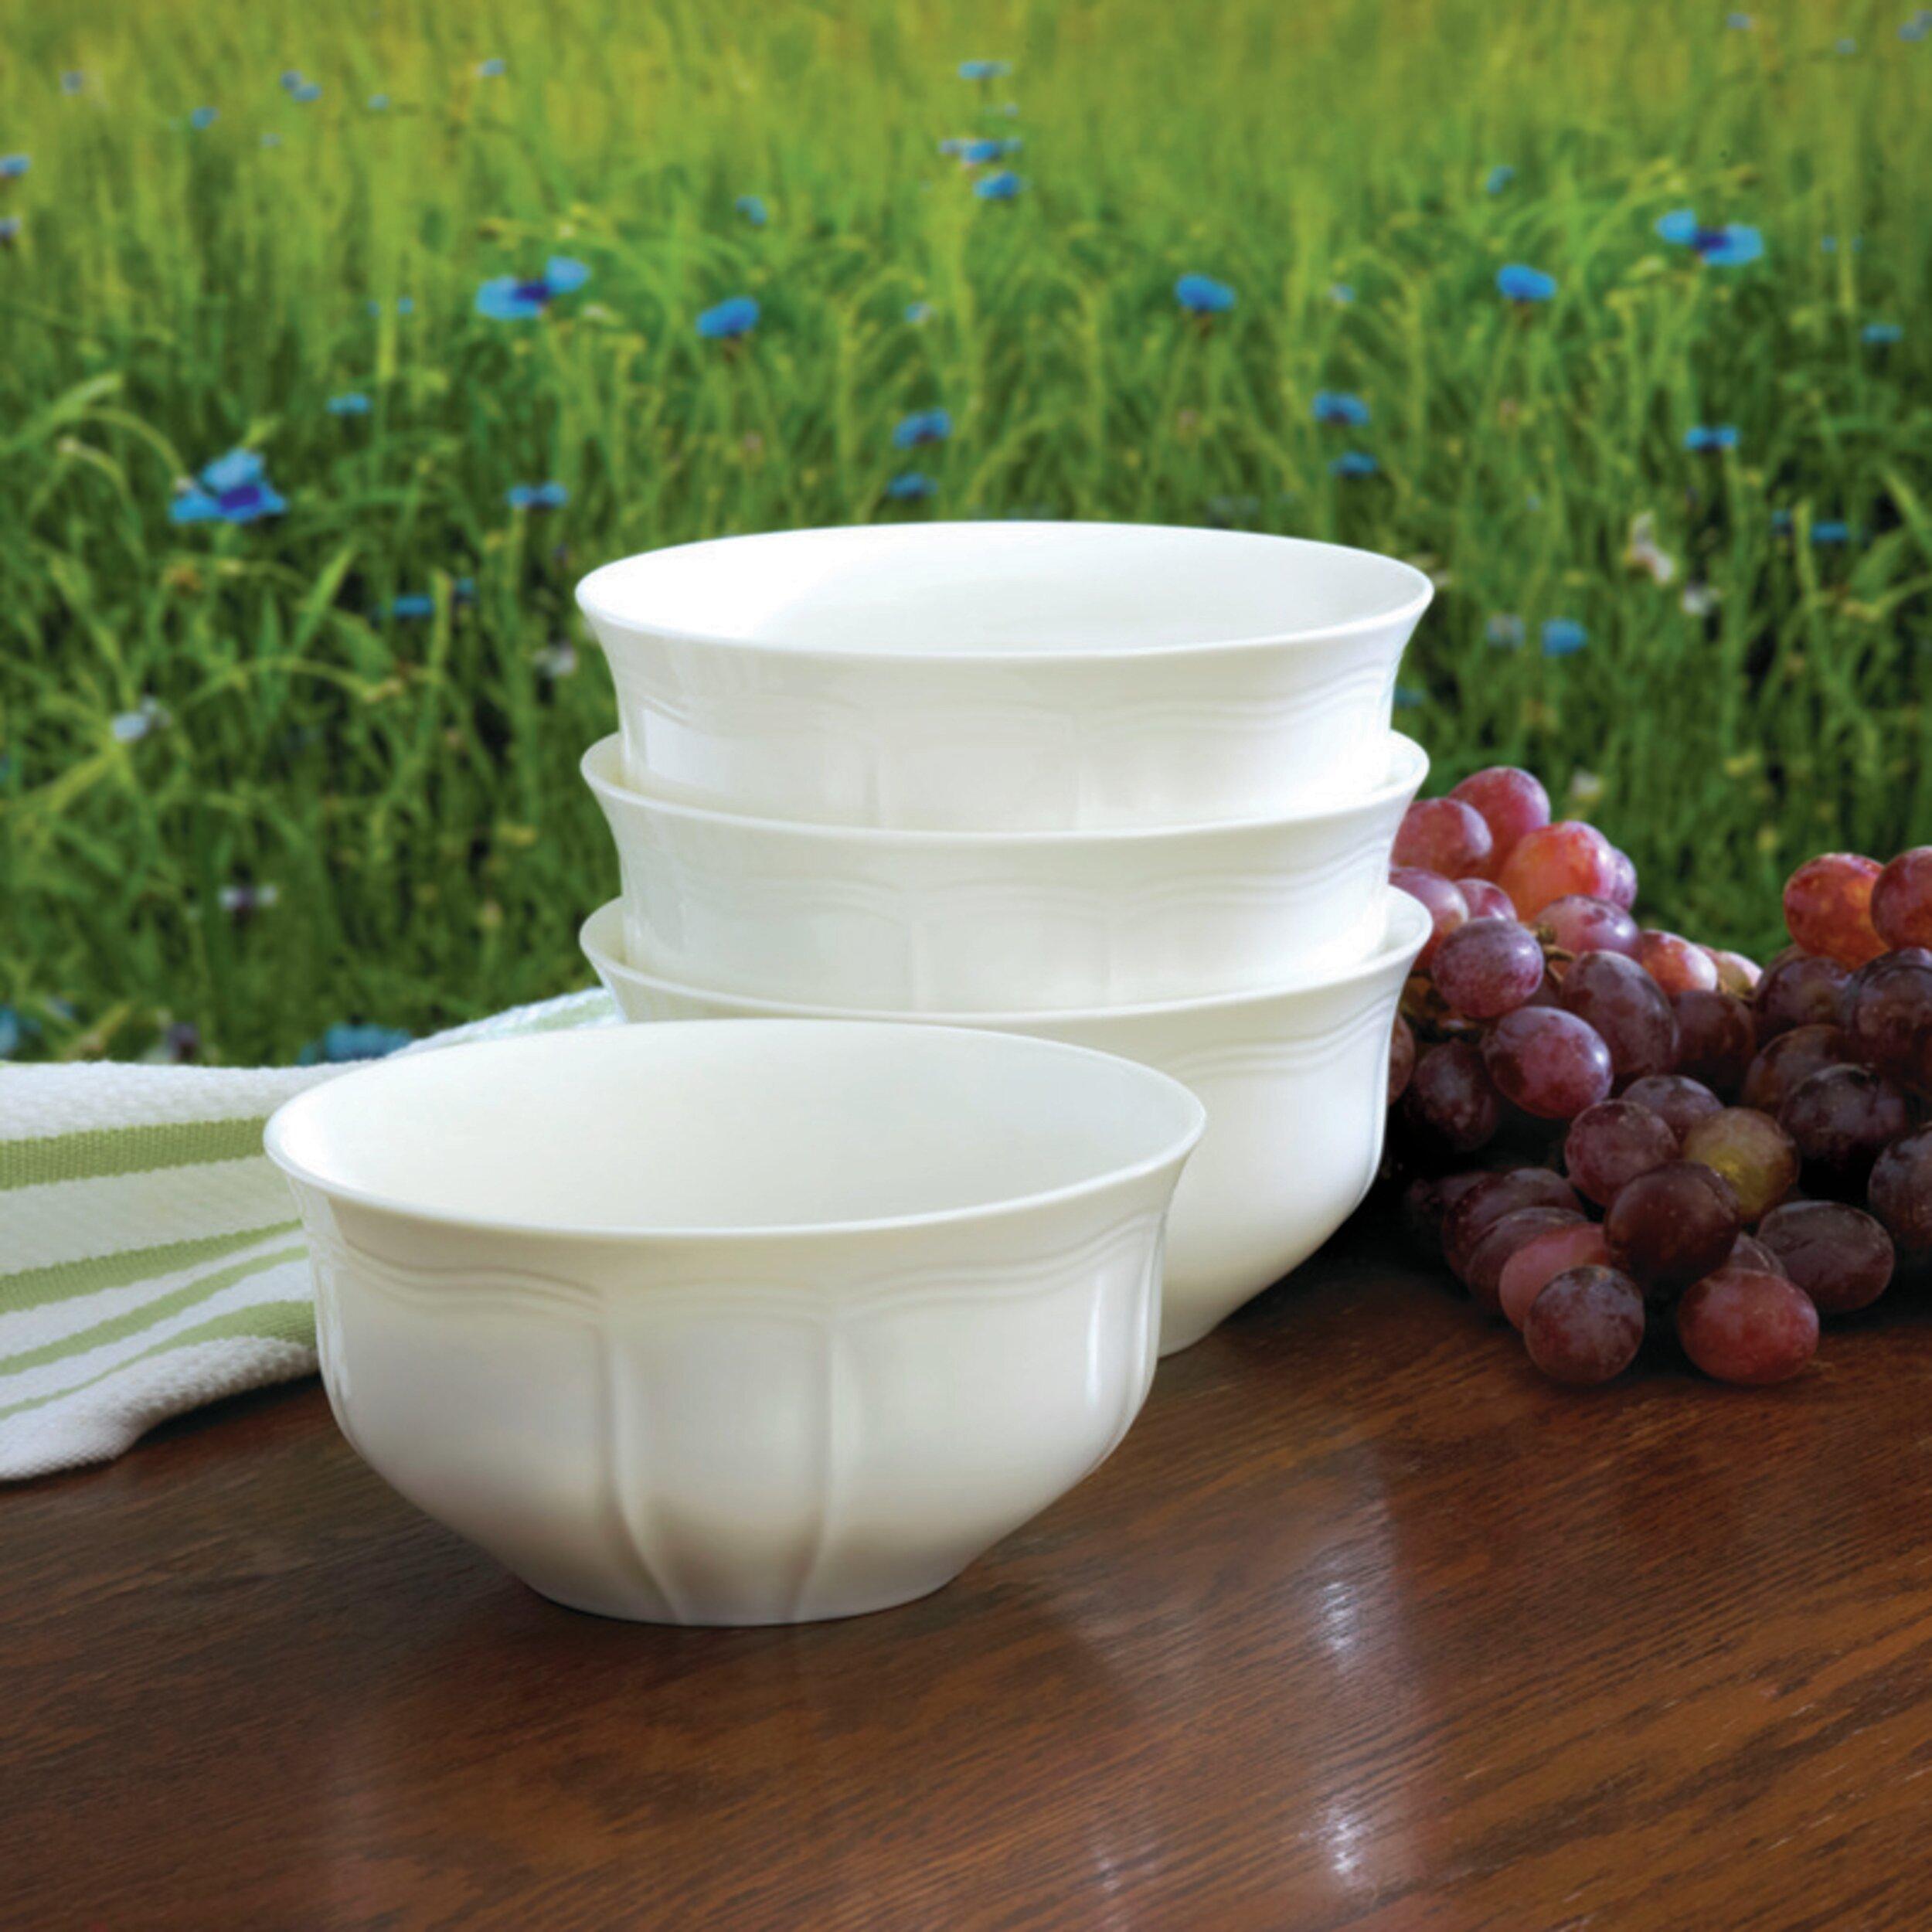 Mikasa Antique White Cereal Bowl Set Of 4 Reviews Wayfair